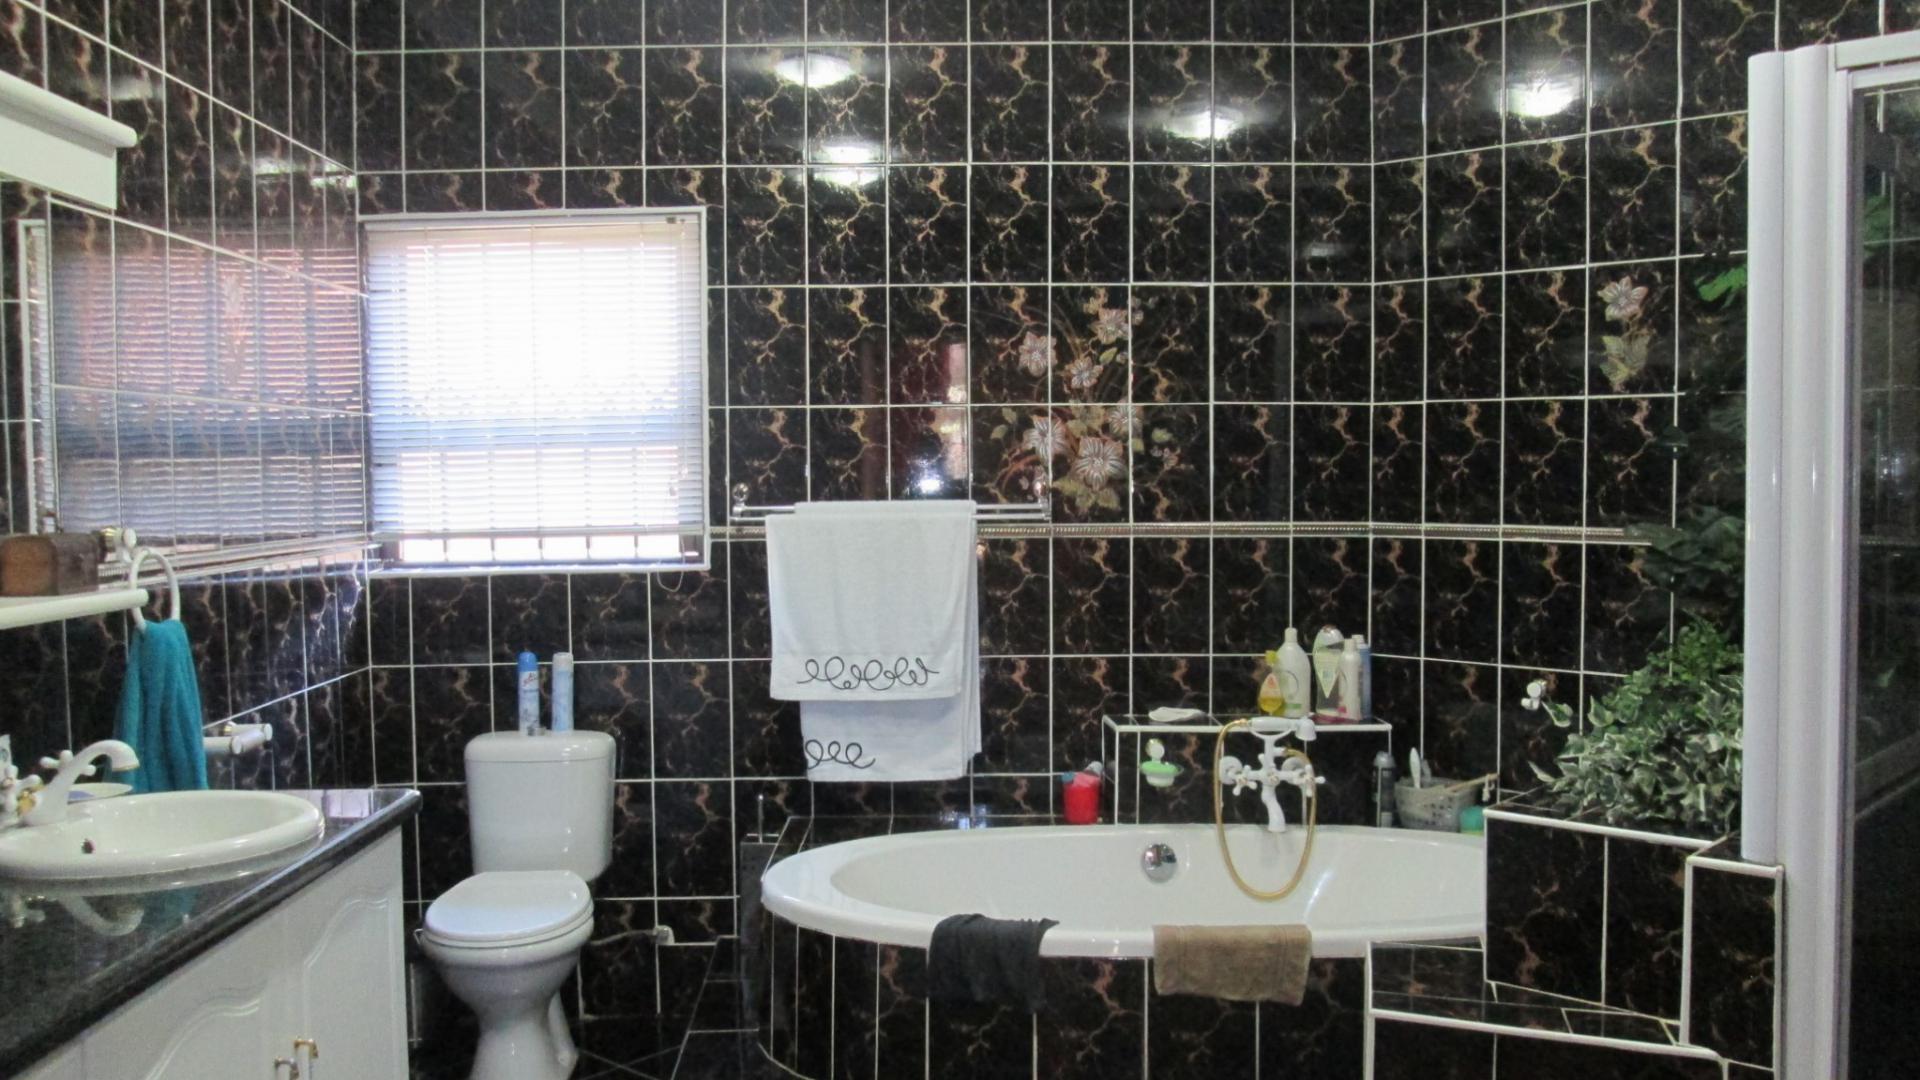 4 Bedroom House for Sale For Sale in Vanderbijlpark - Private Sale ...